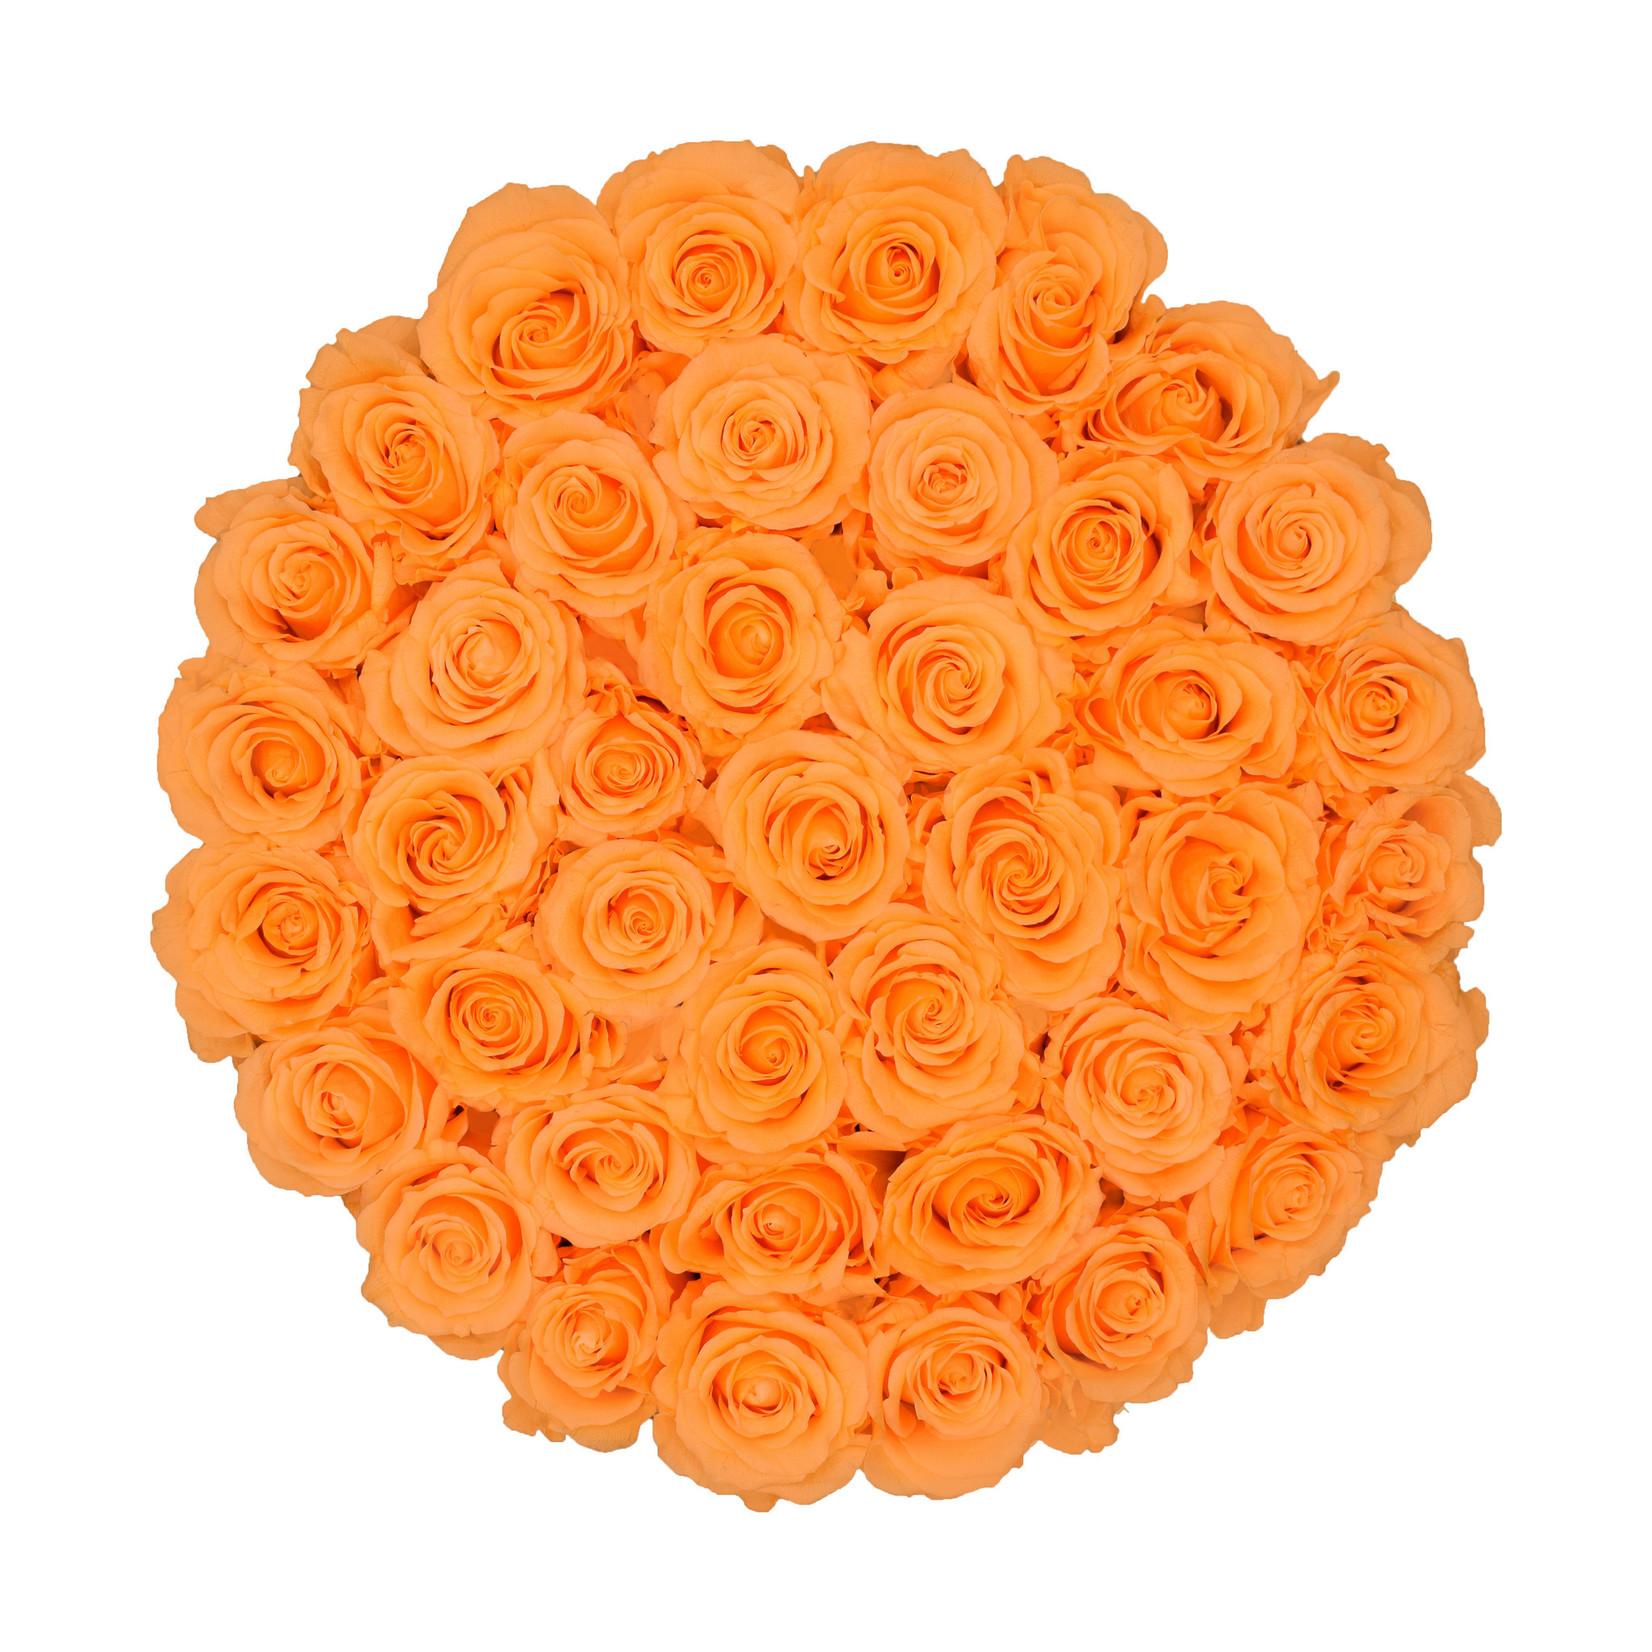 Extra Large - Peach Endless Roses - Black Box